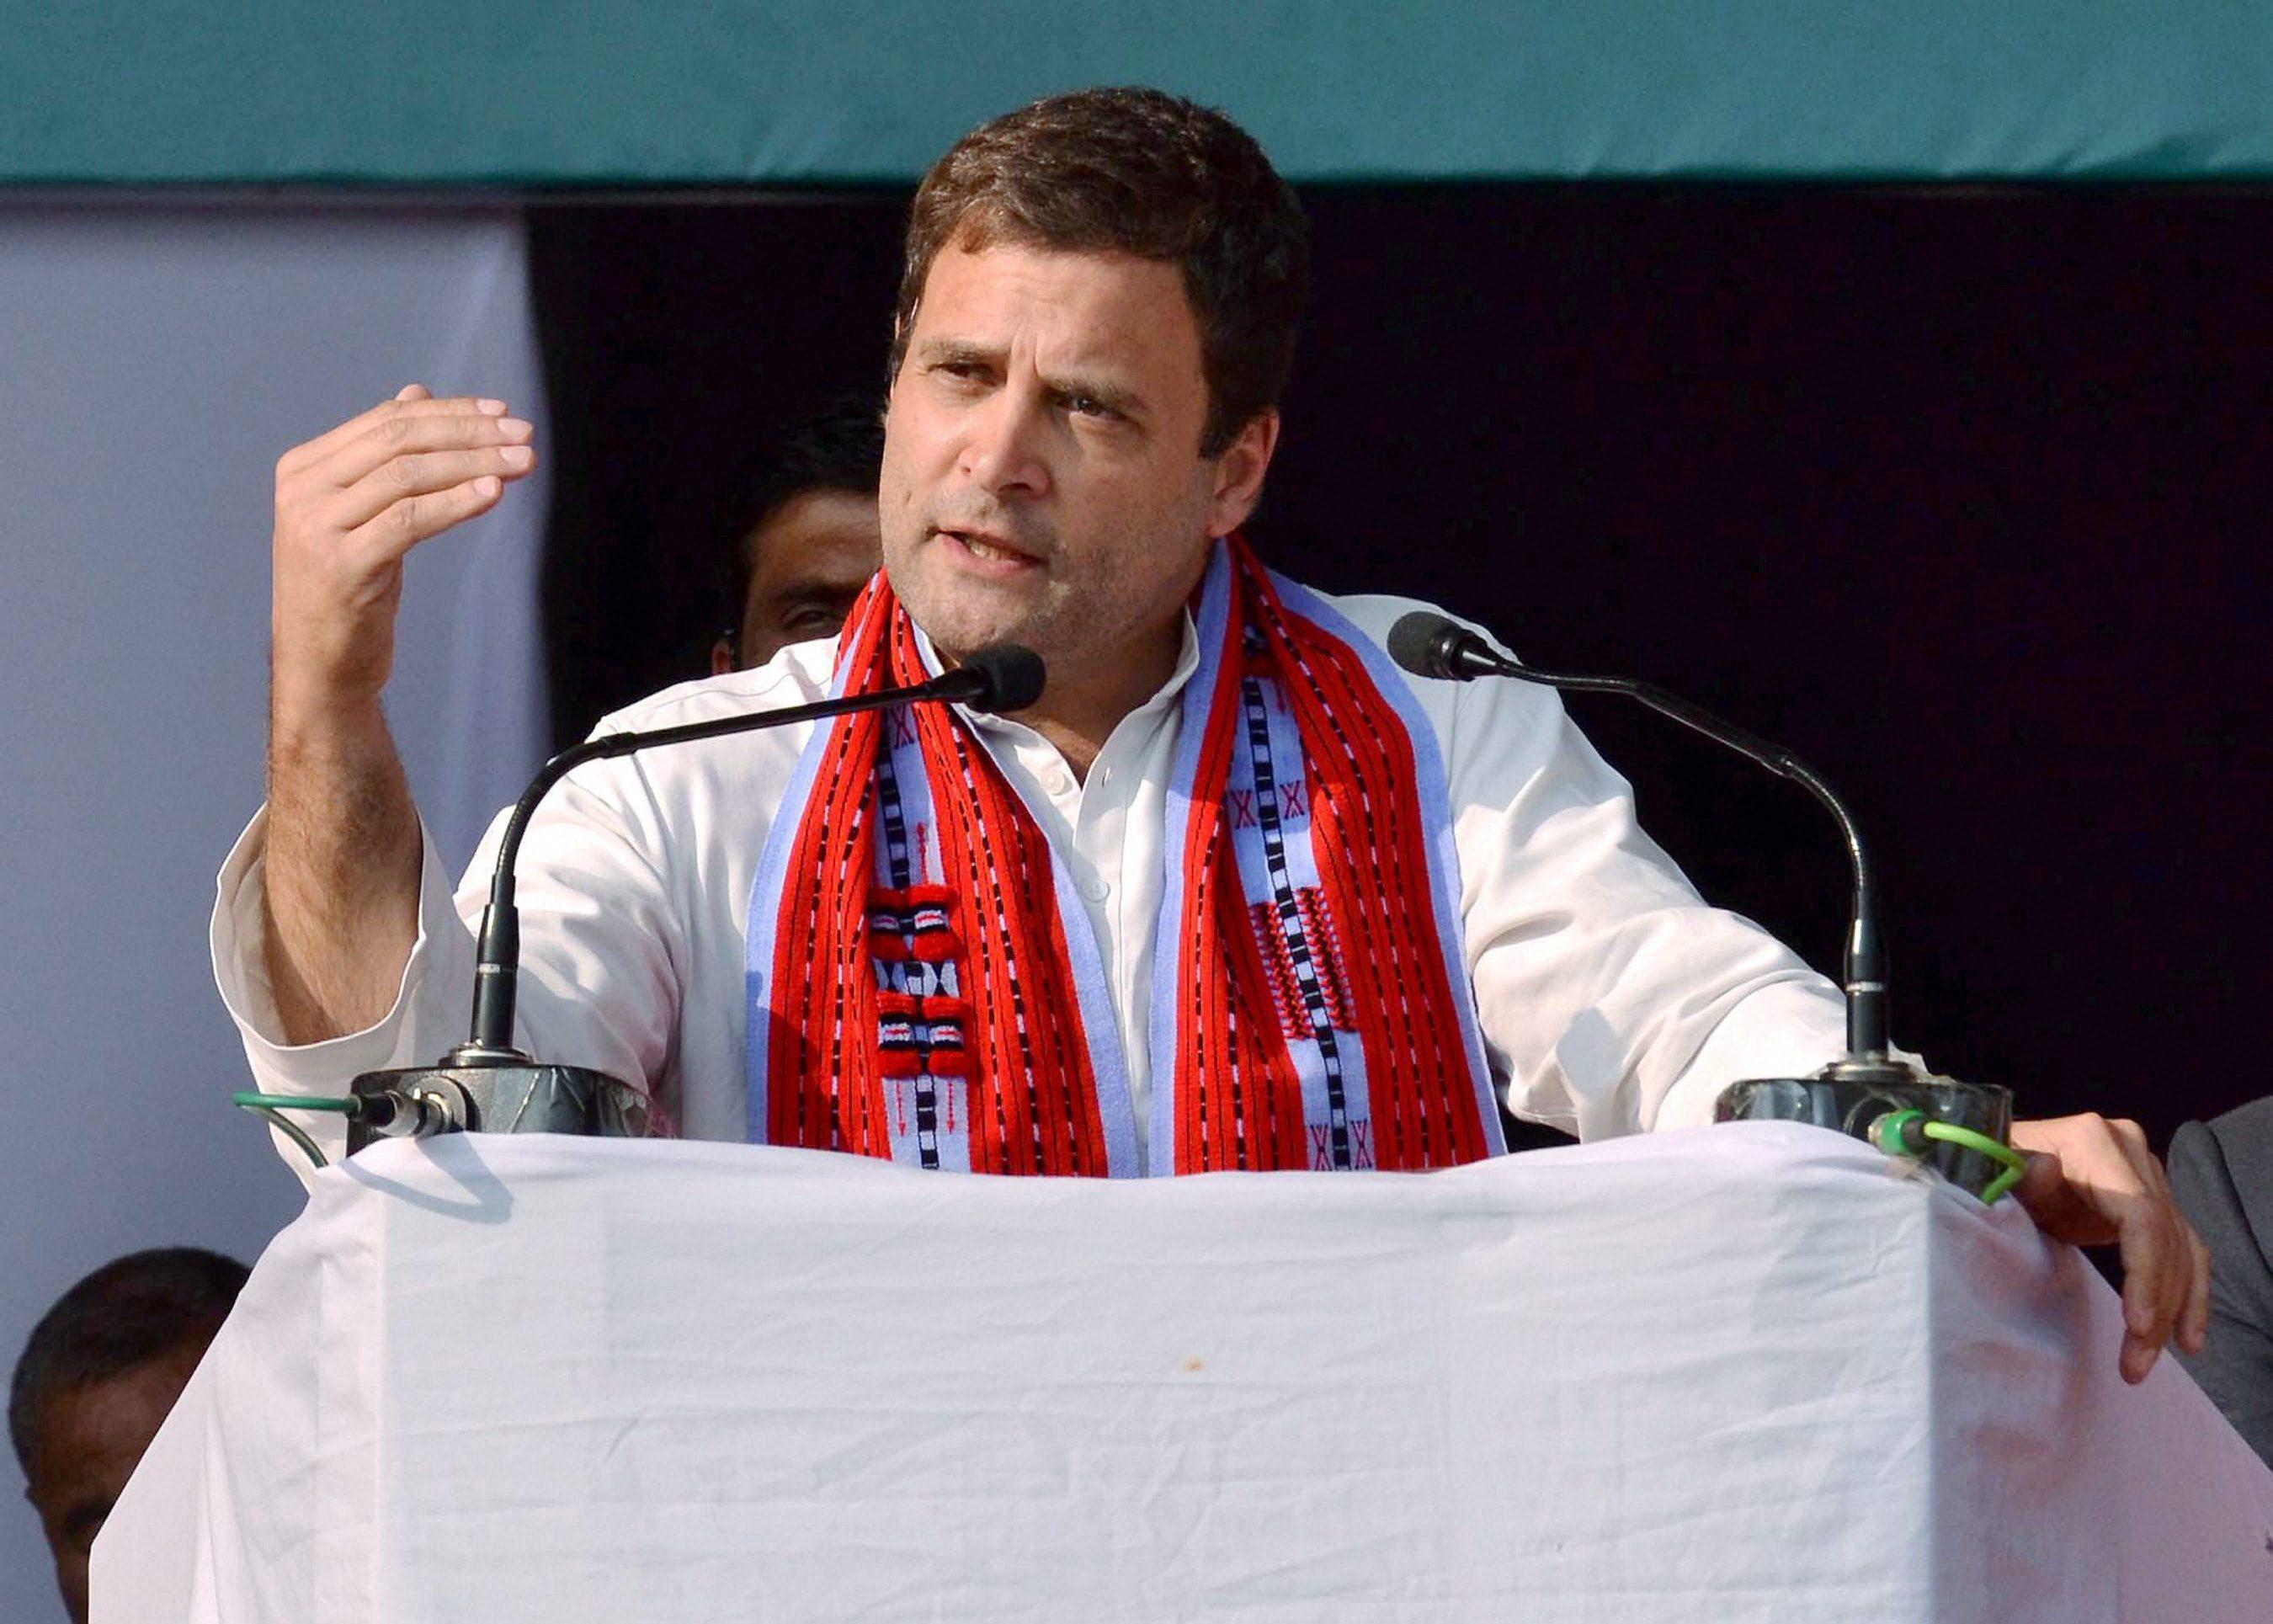 Modi should make contents of Naga Accord public: Rahul